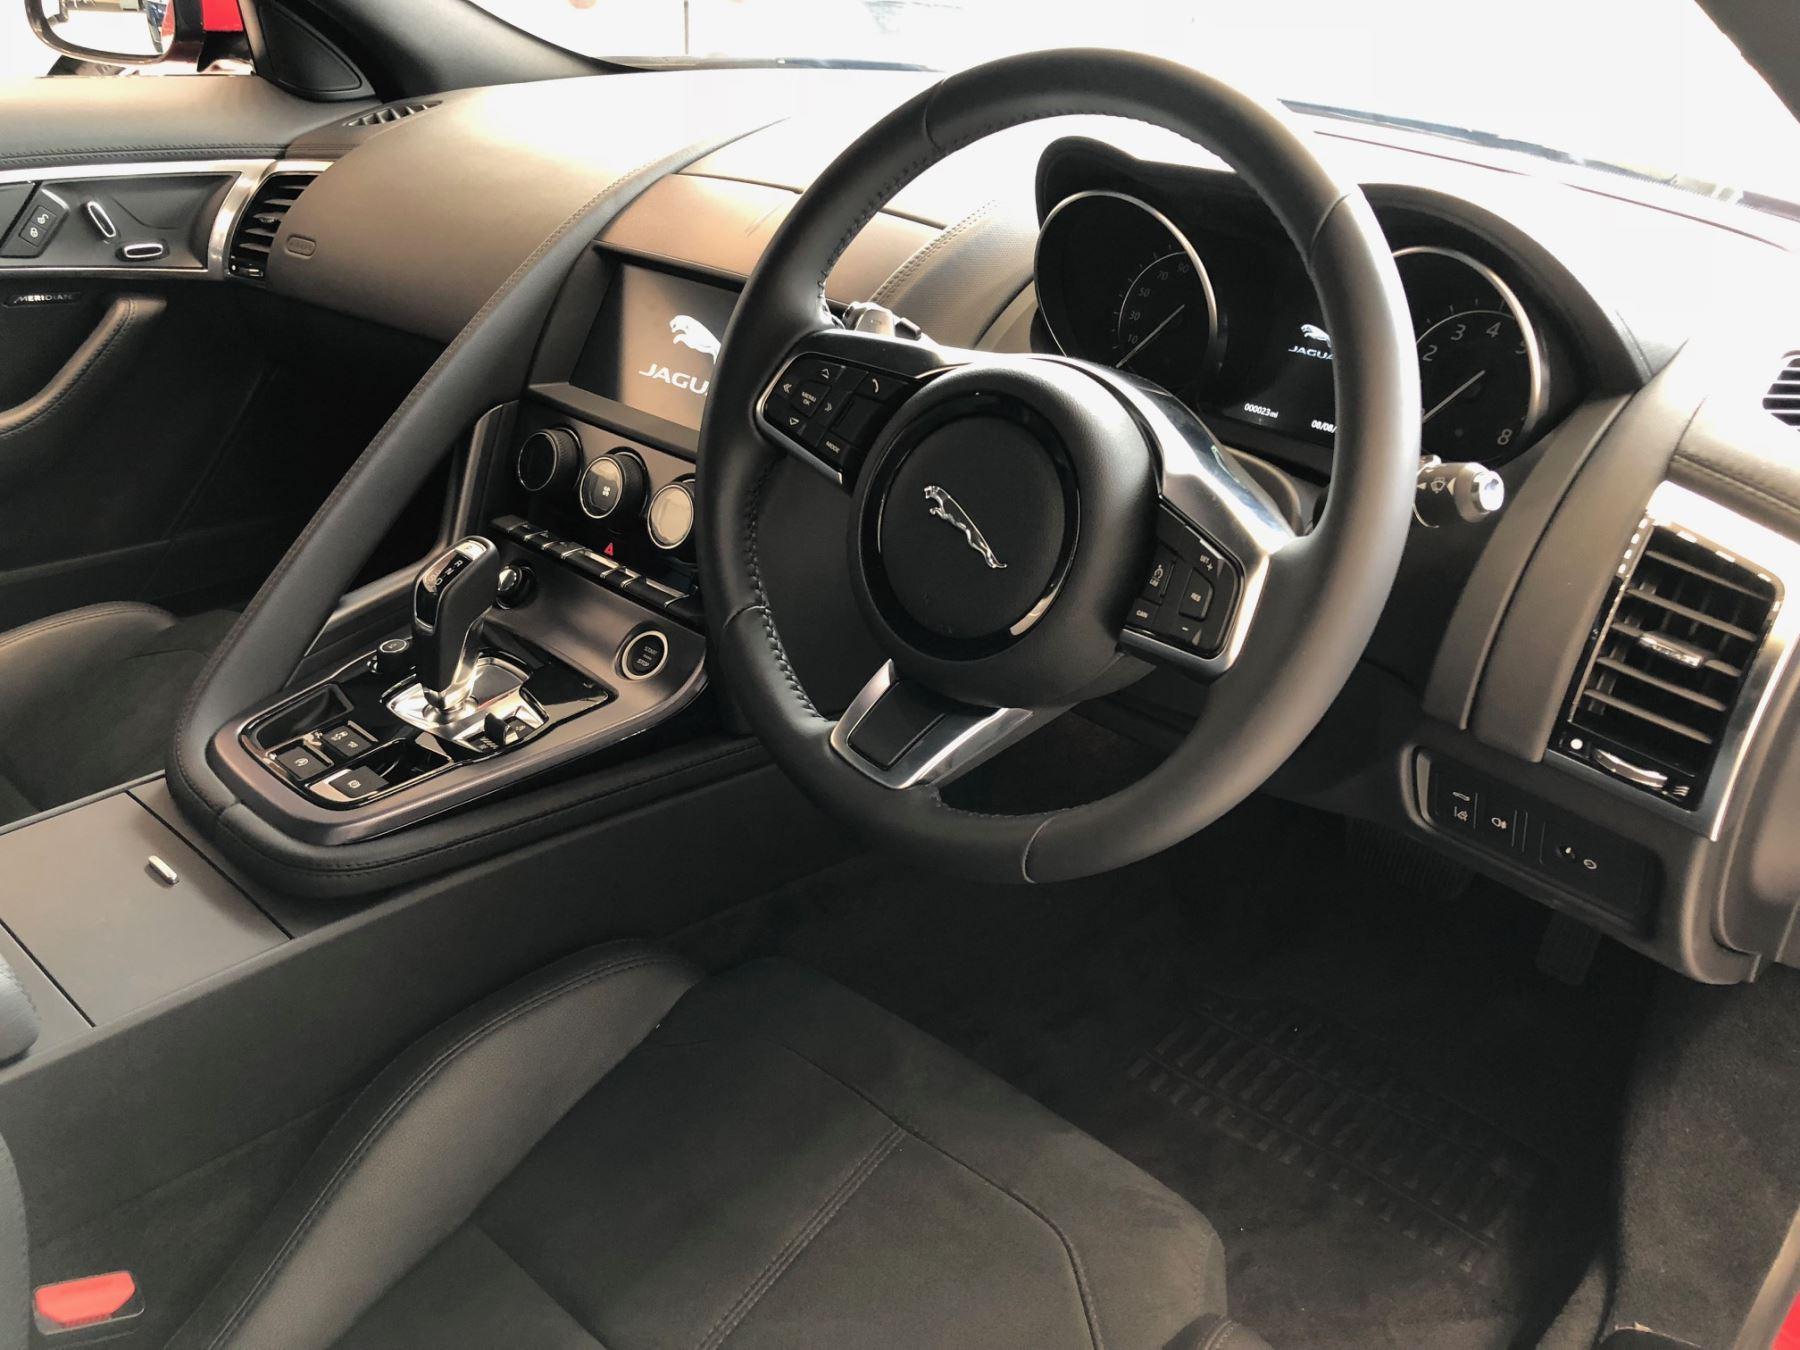 Jaguar F-TYPE 2.0 300PS RWD R-Dynamic image 4